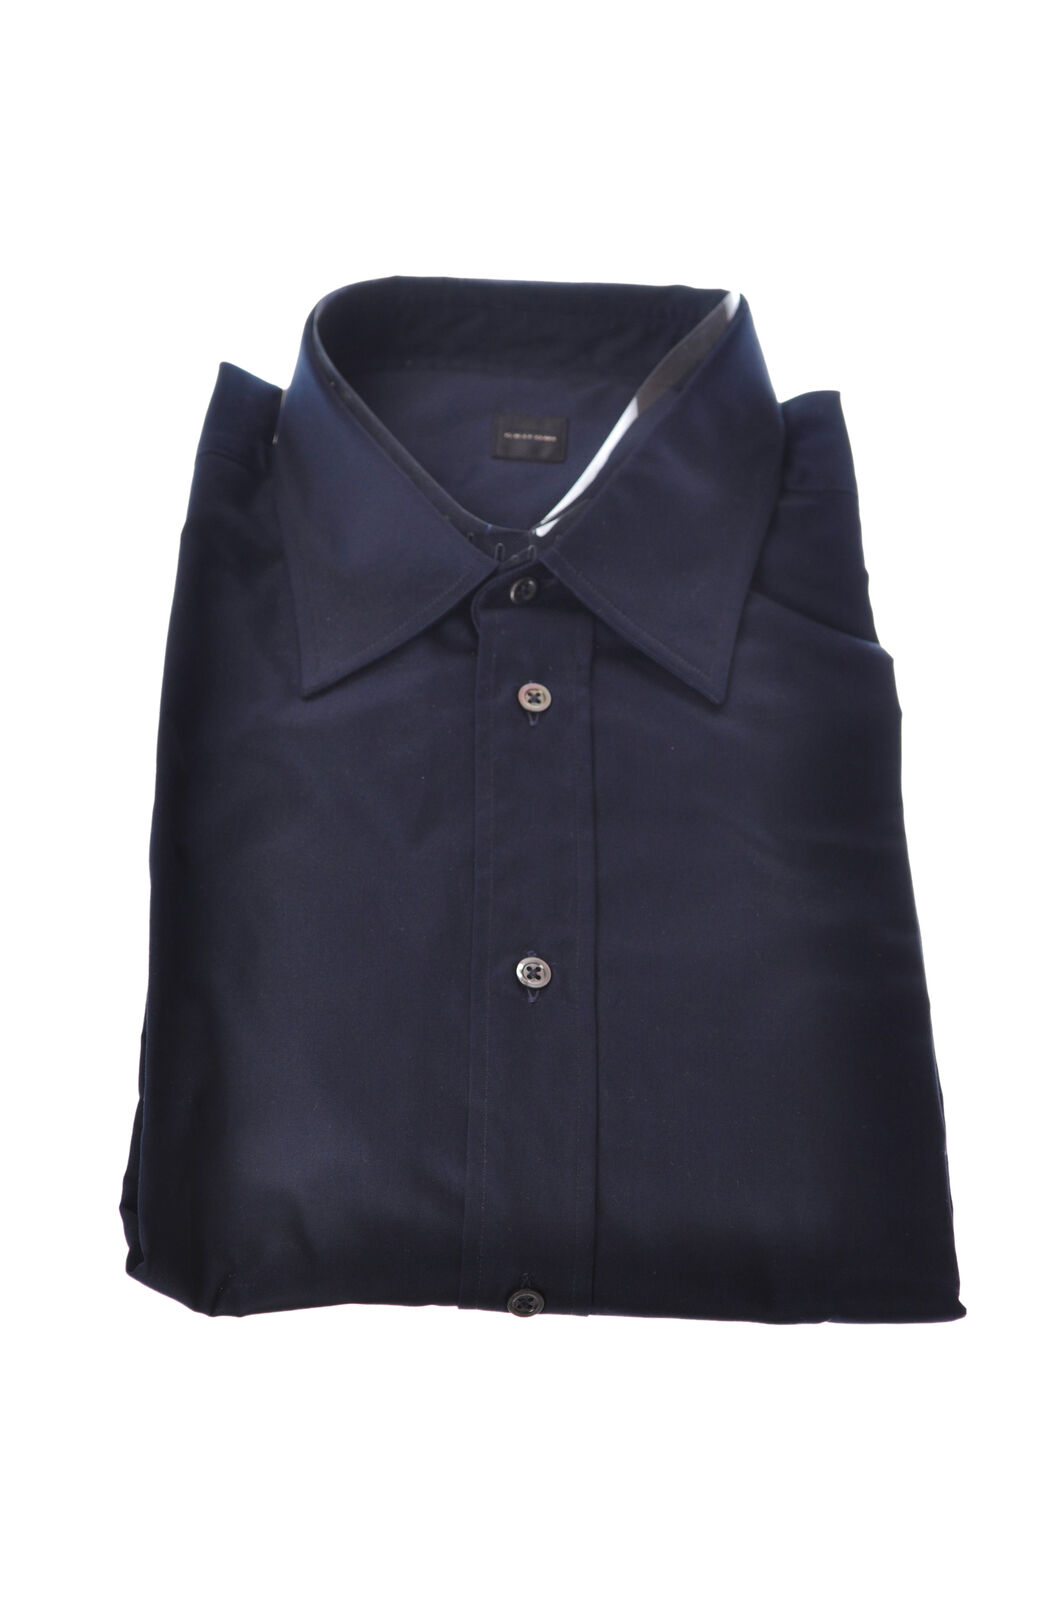 Mauro grifoni  -  Shirt - Male - bluee - 3002205A183647